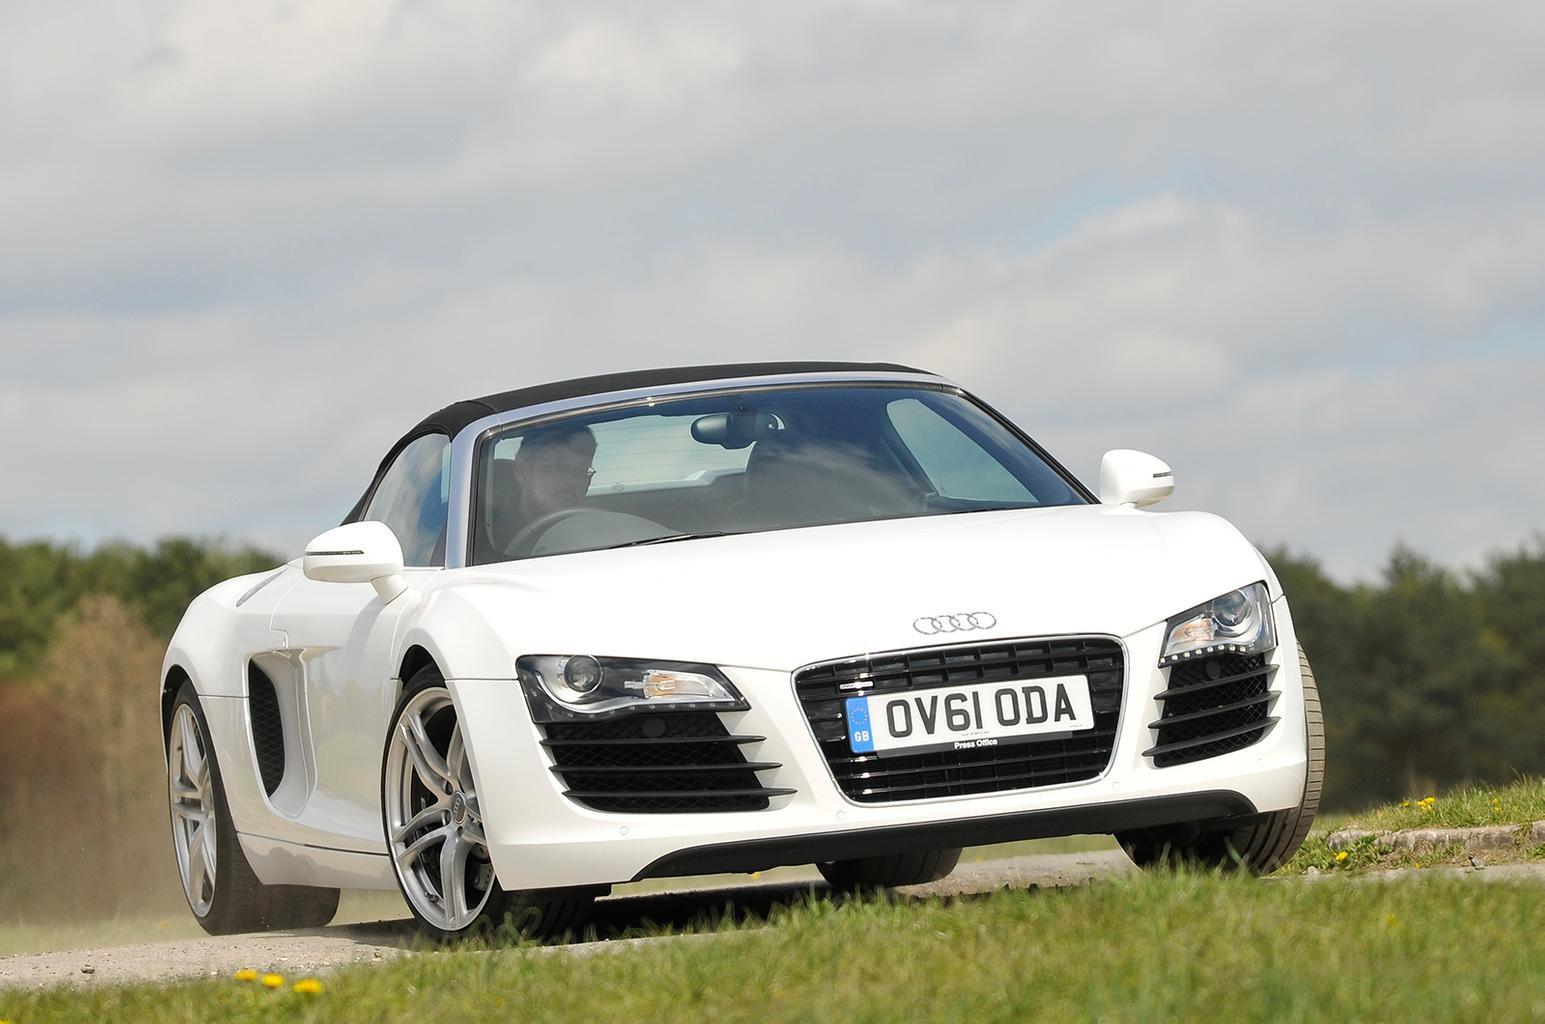 Used test: Audi R8 Spyder vs Porsche 911 Cabriolet